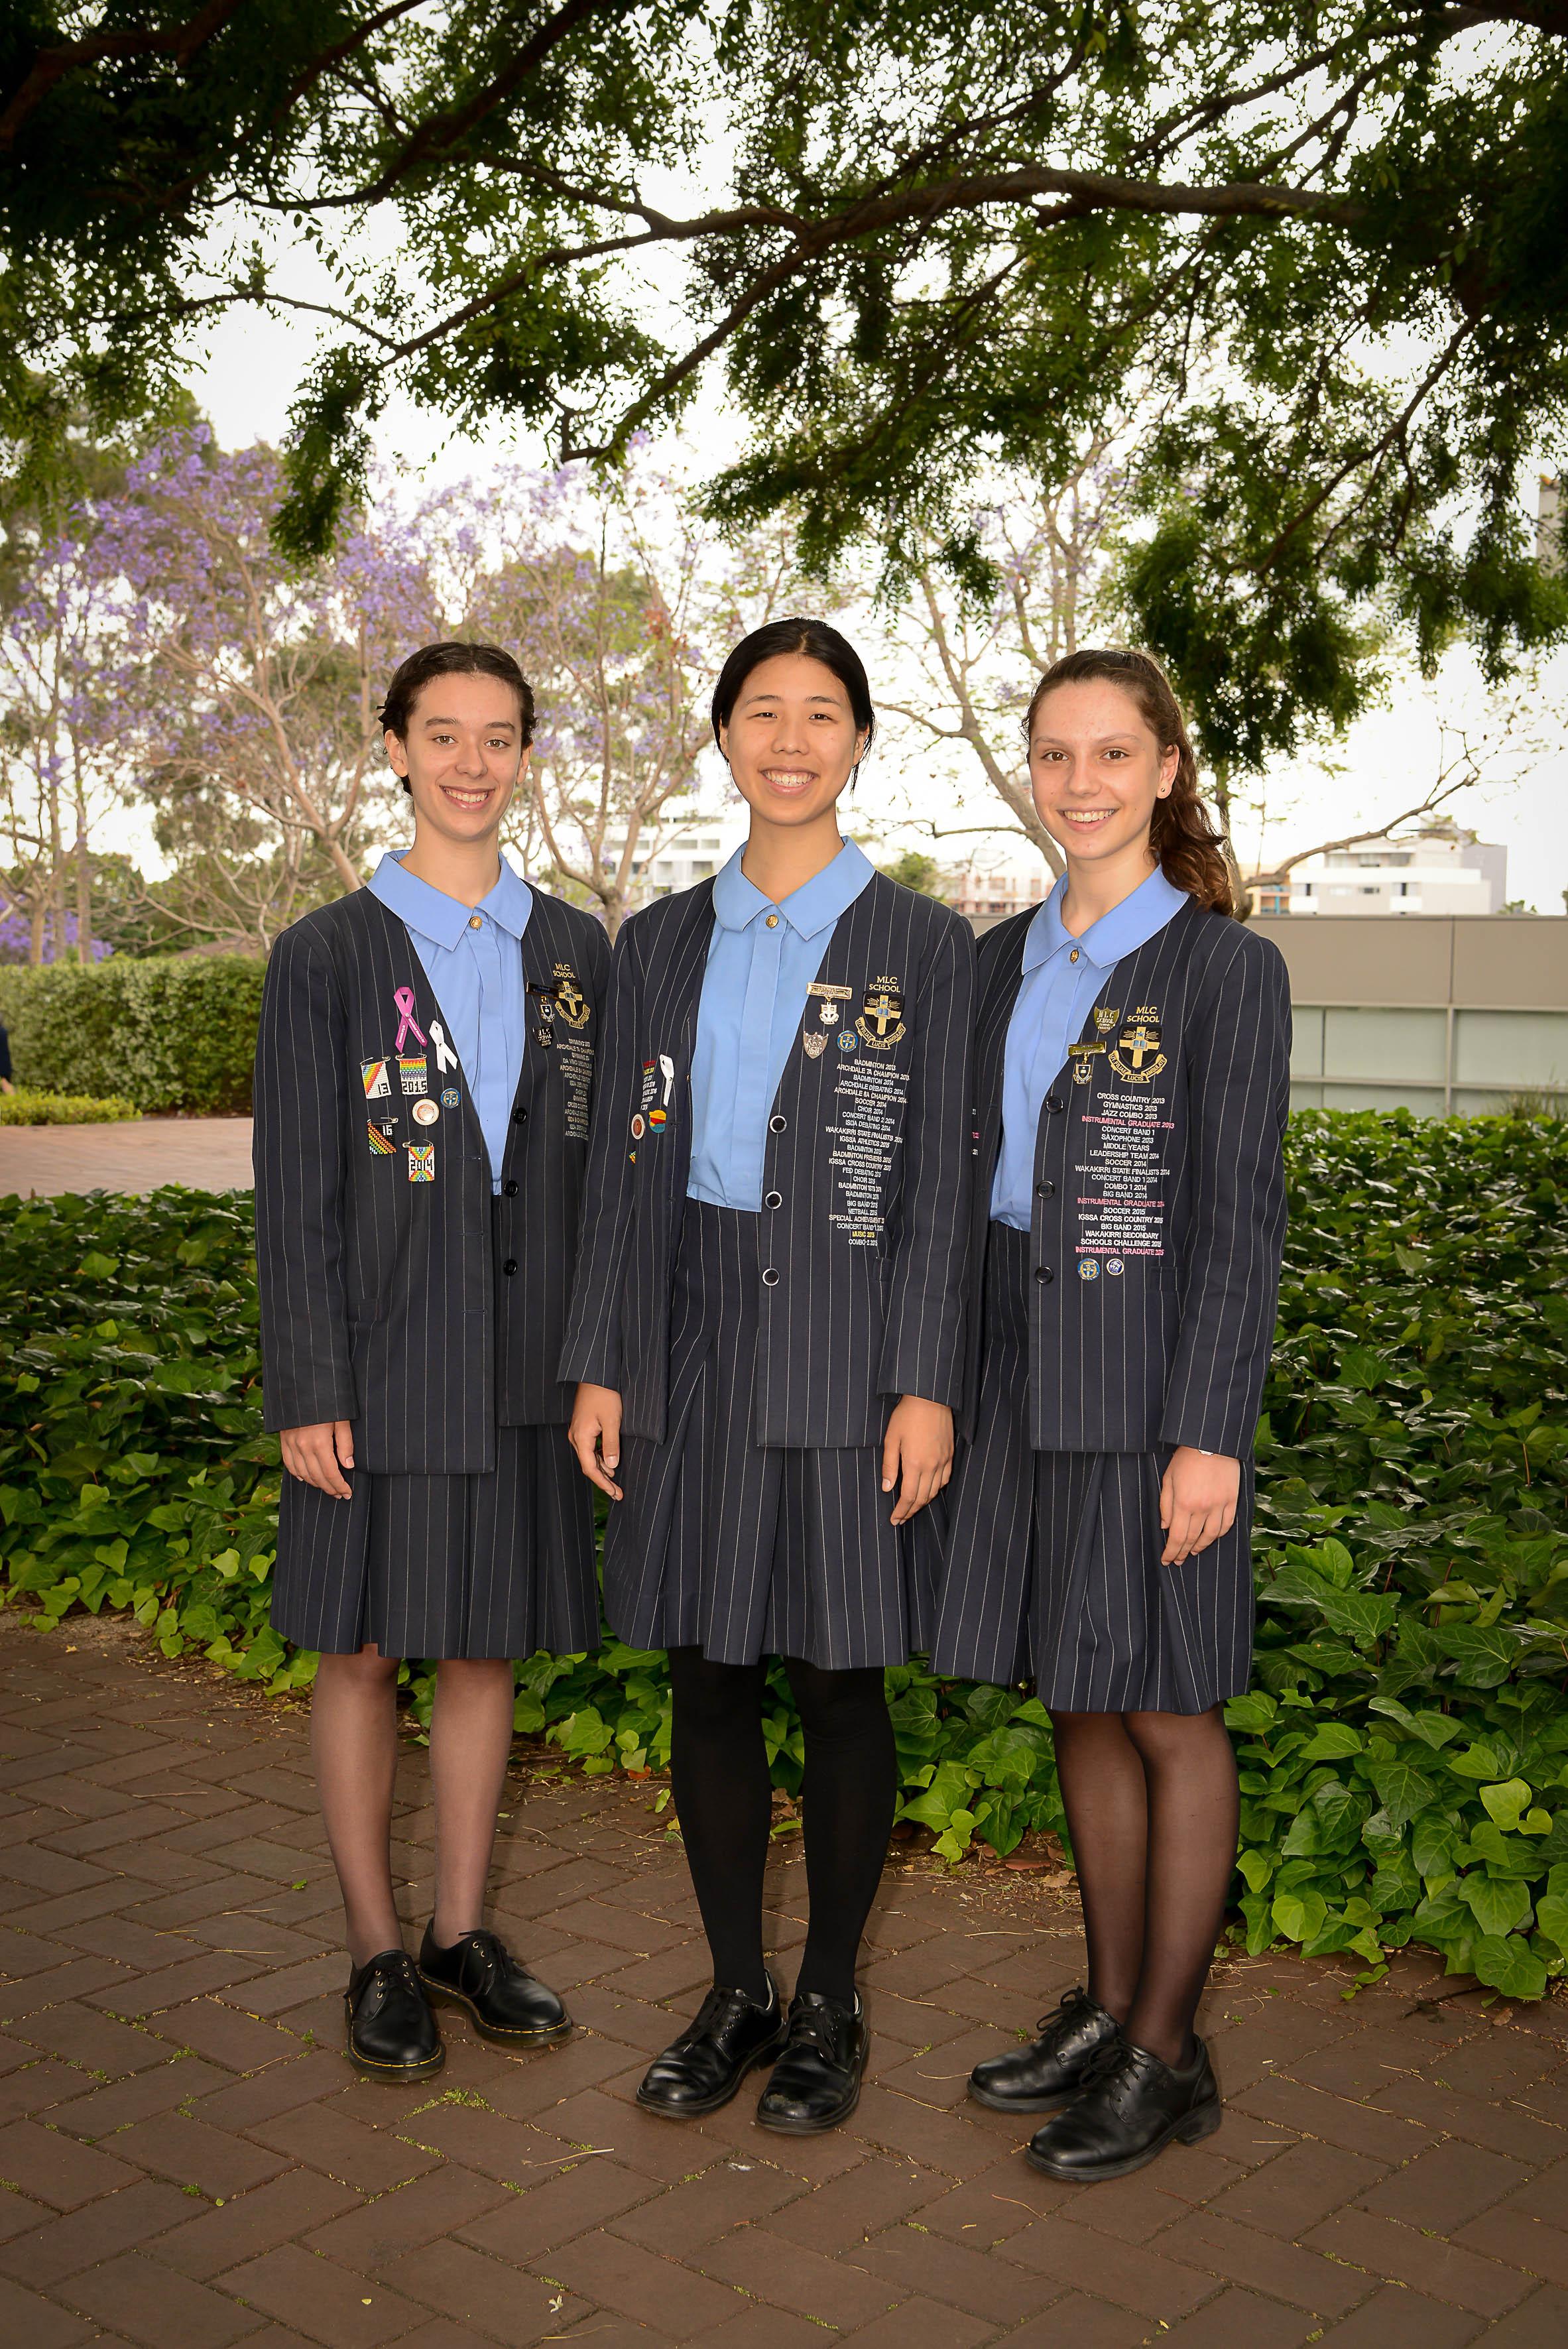 1be72c7b4 Uniforms and Equipment - MLC School